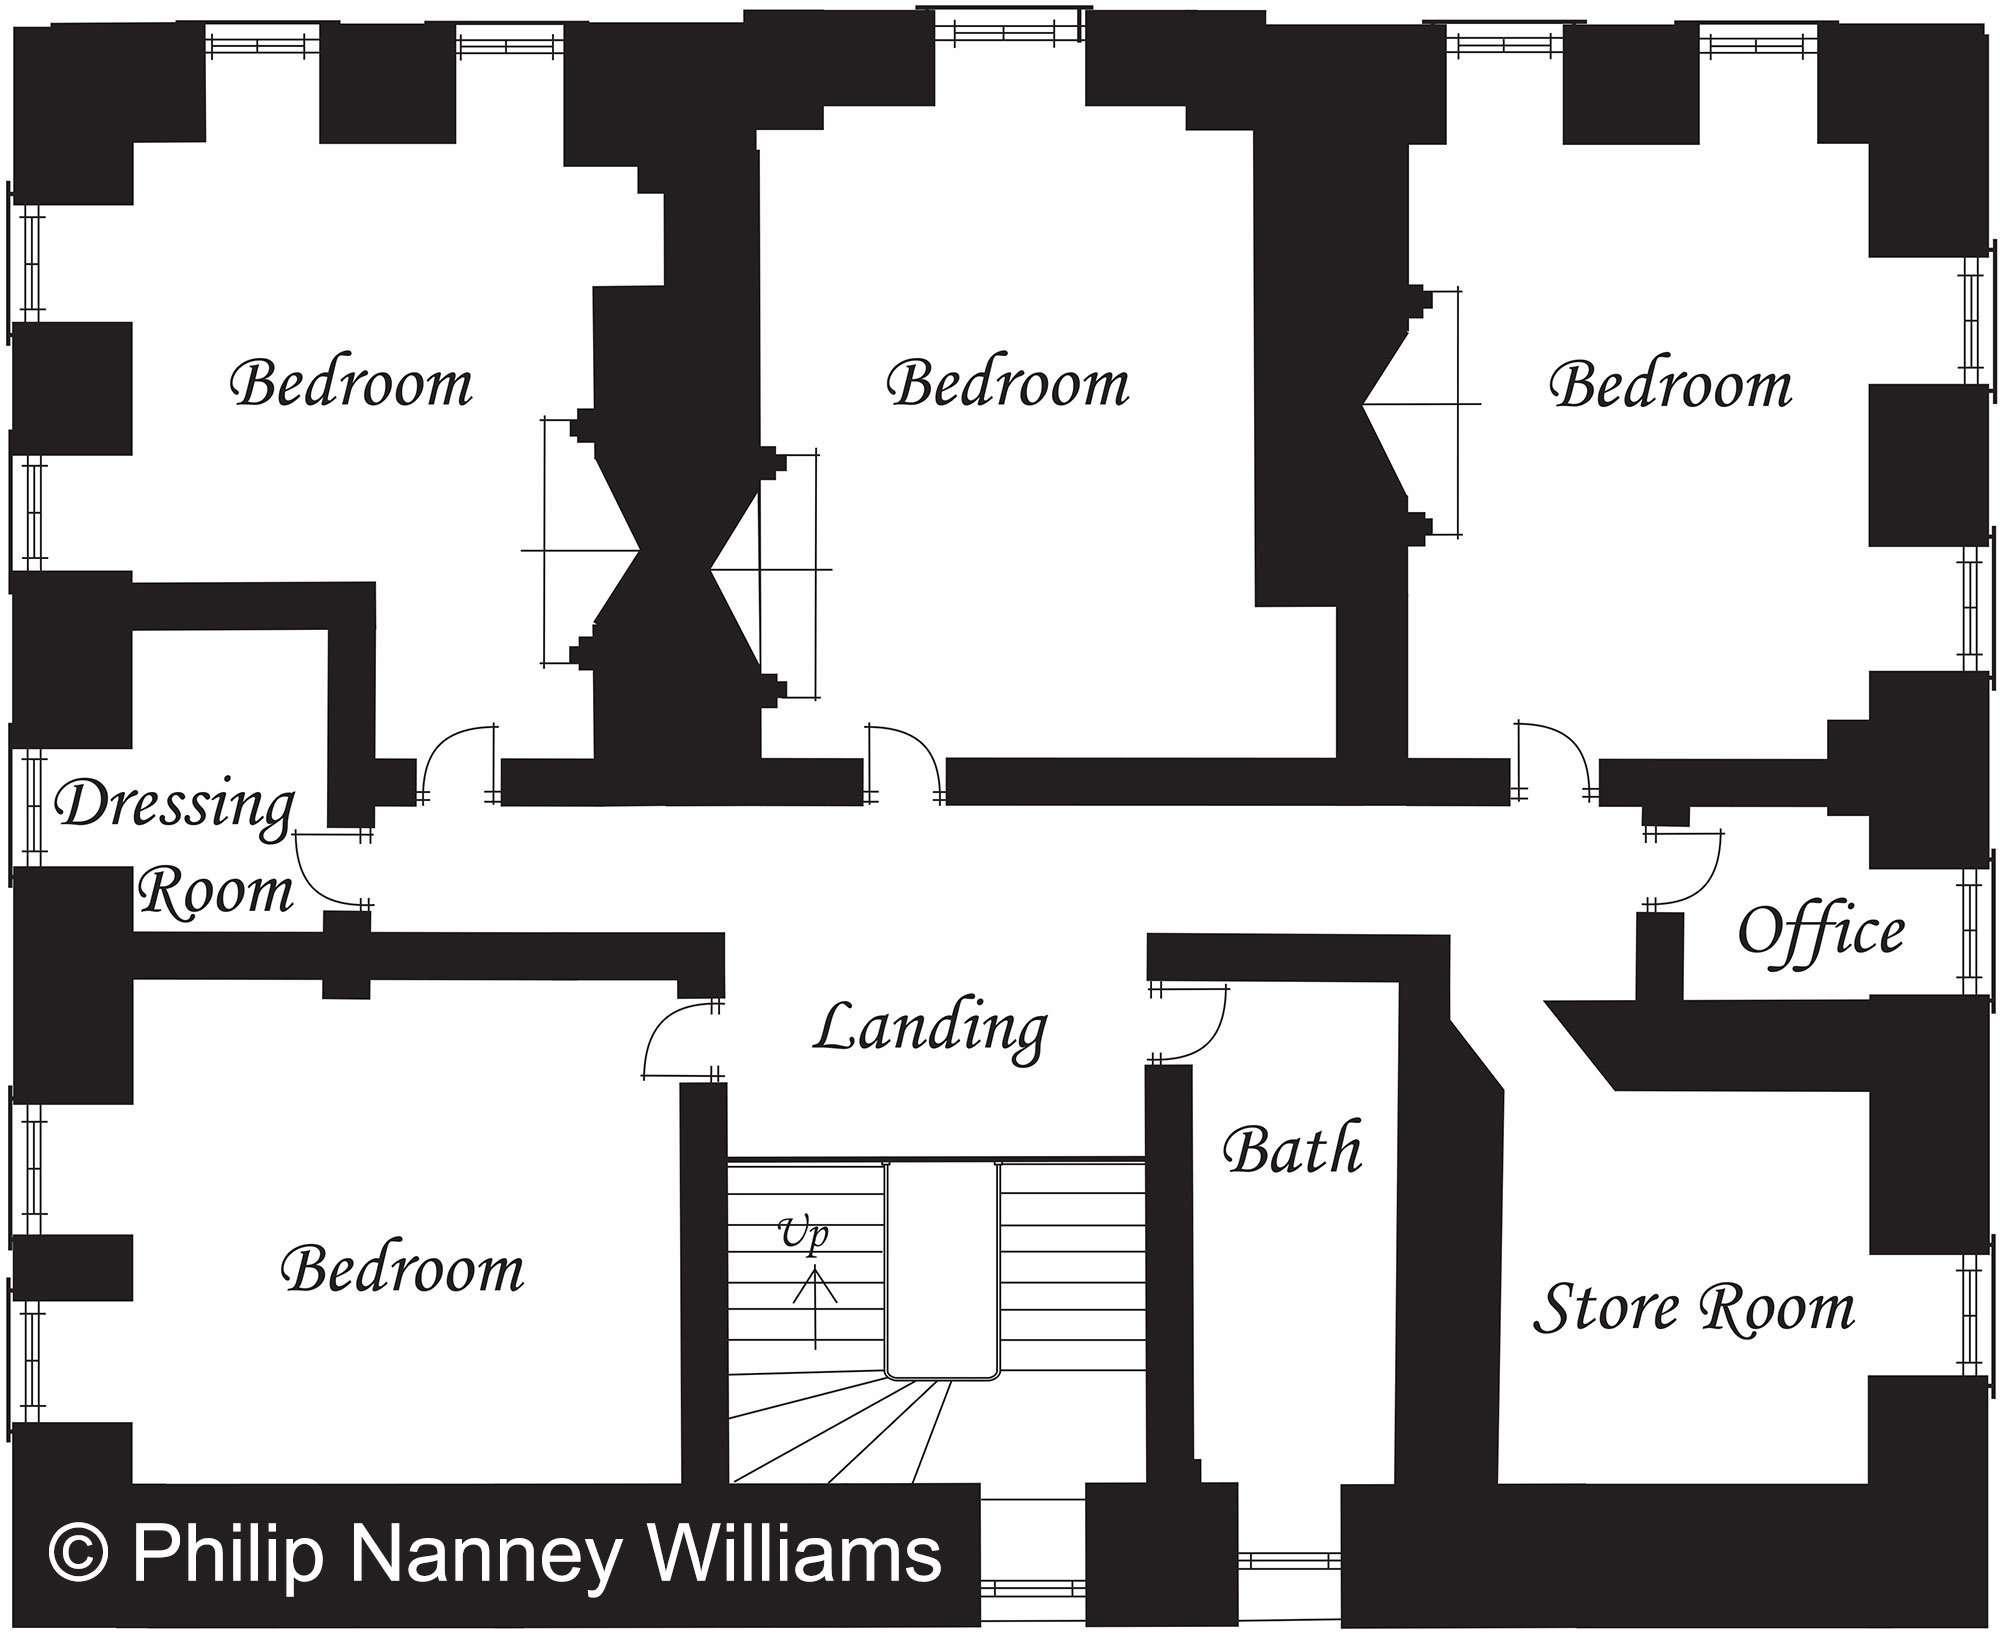 First Floor - © Philip Nanney Williams